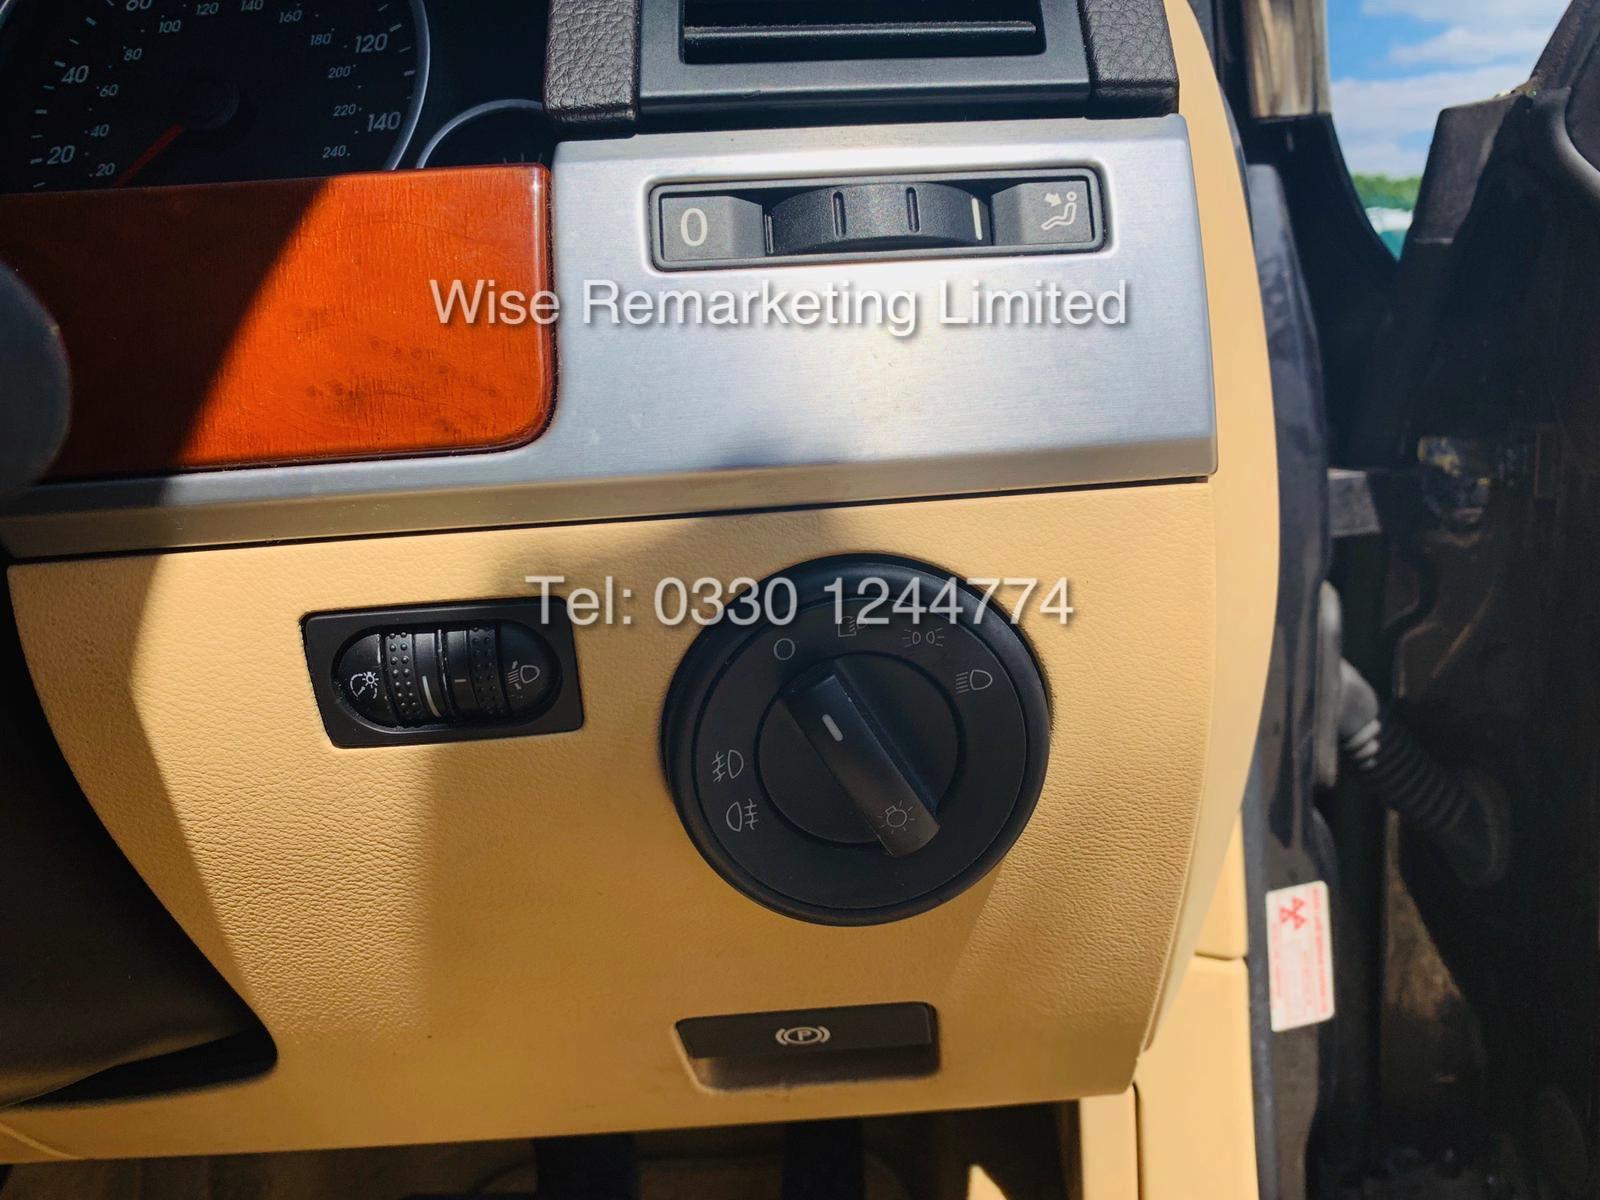 VOLKSWAGEN TOUAREG 2.5 TDI SPORT AUTO 2004 REG 4x4 BLACK - CREAM LEATHER - Image 14 of 24